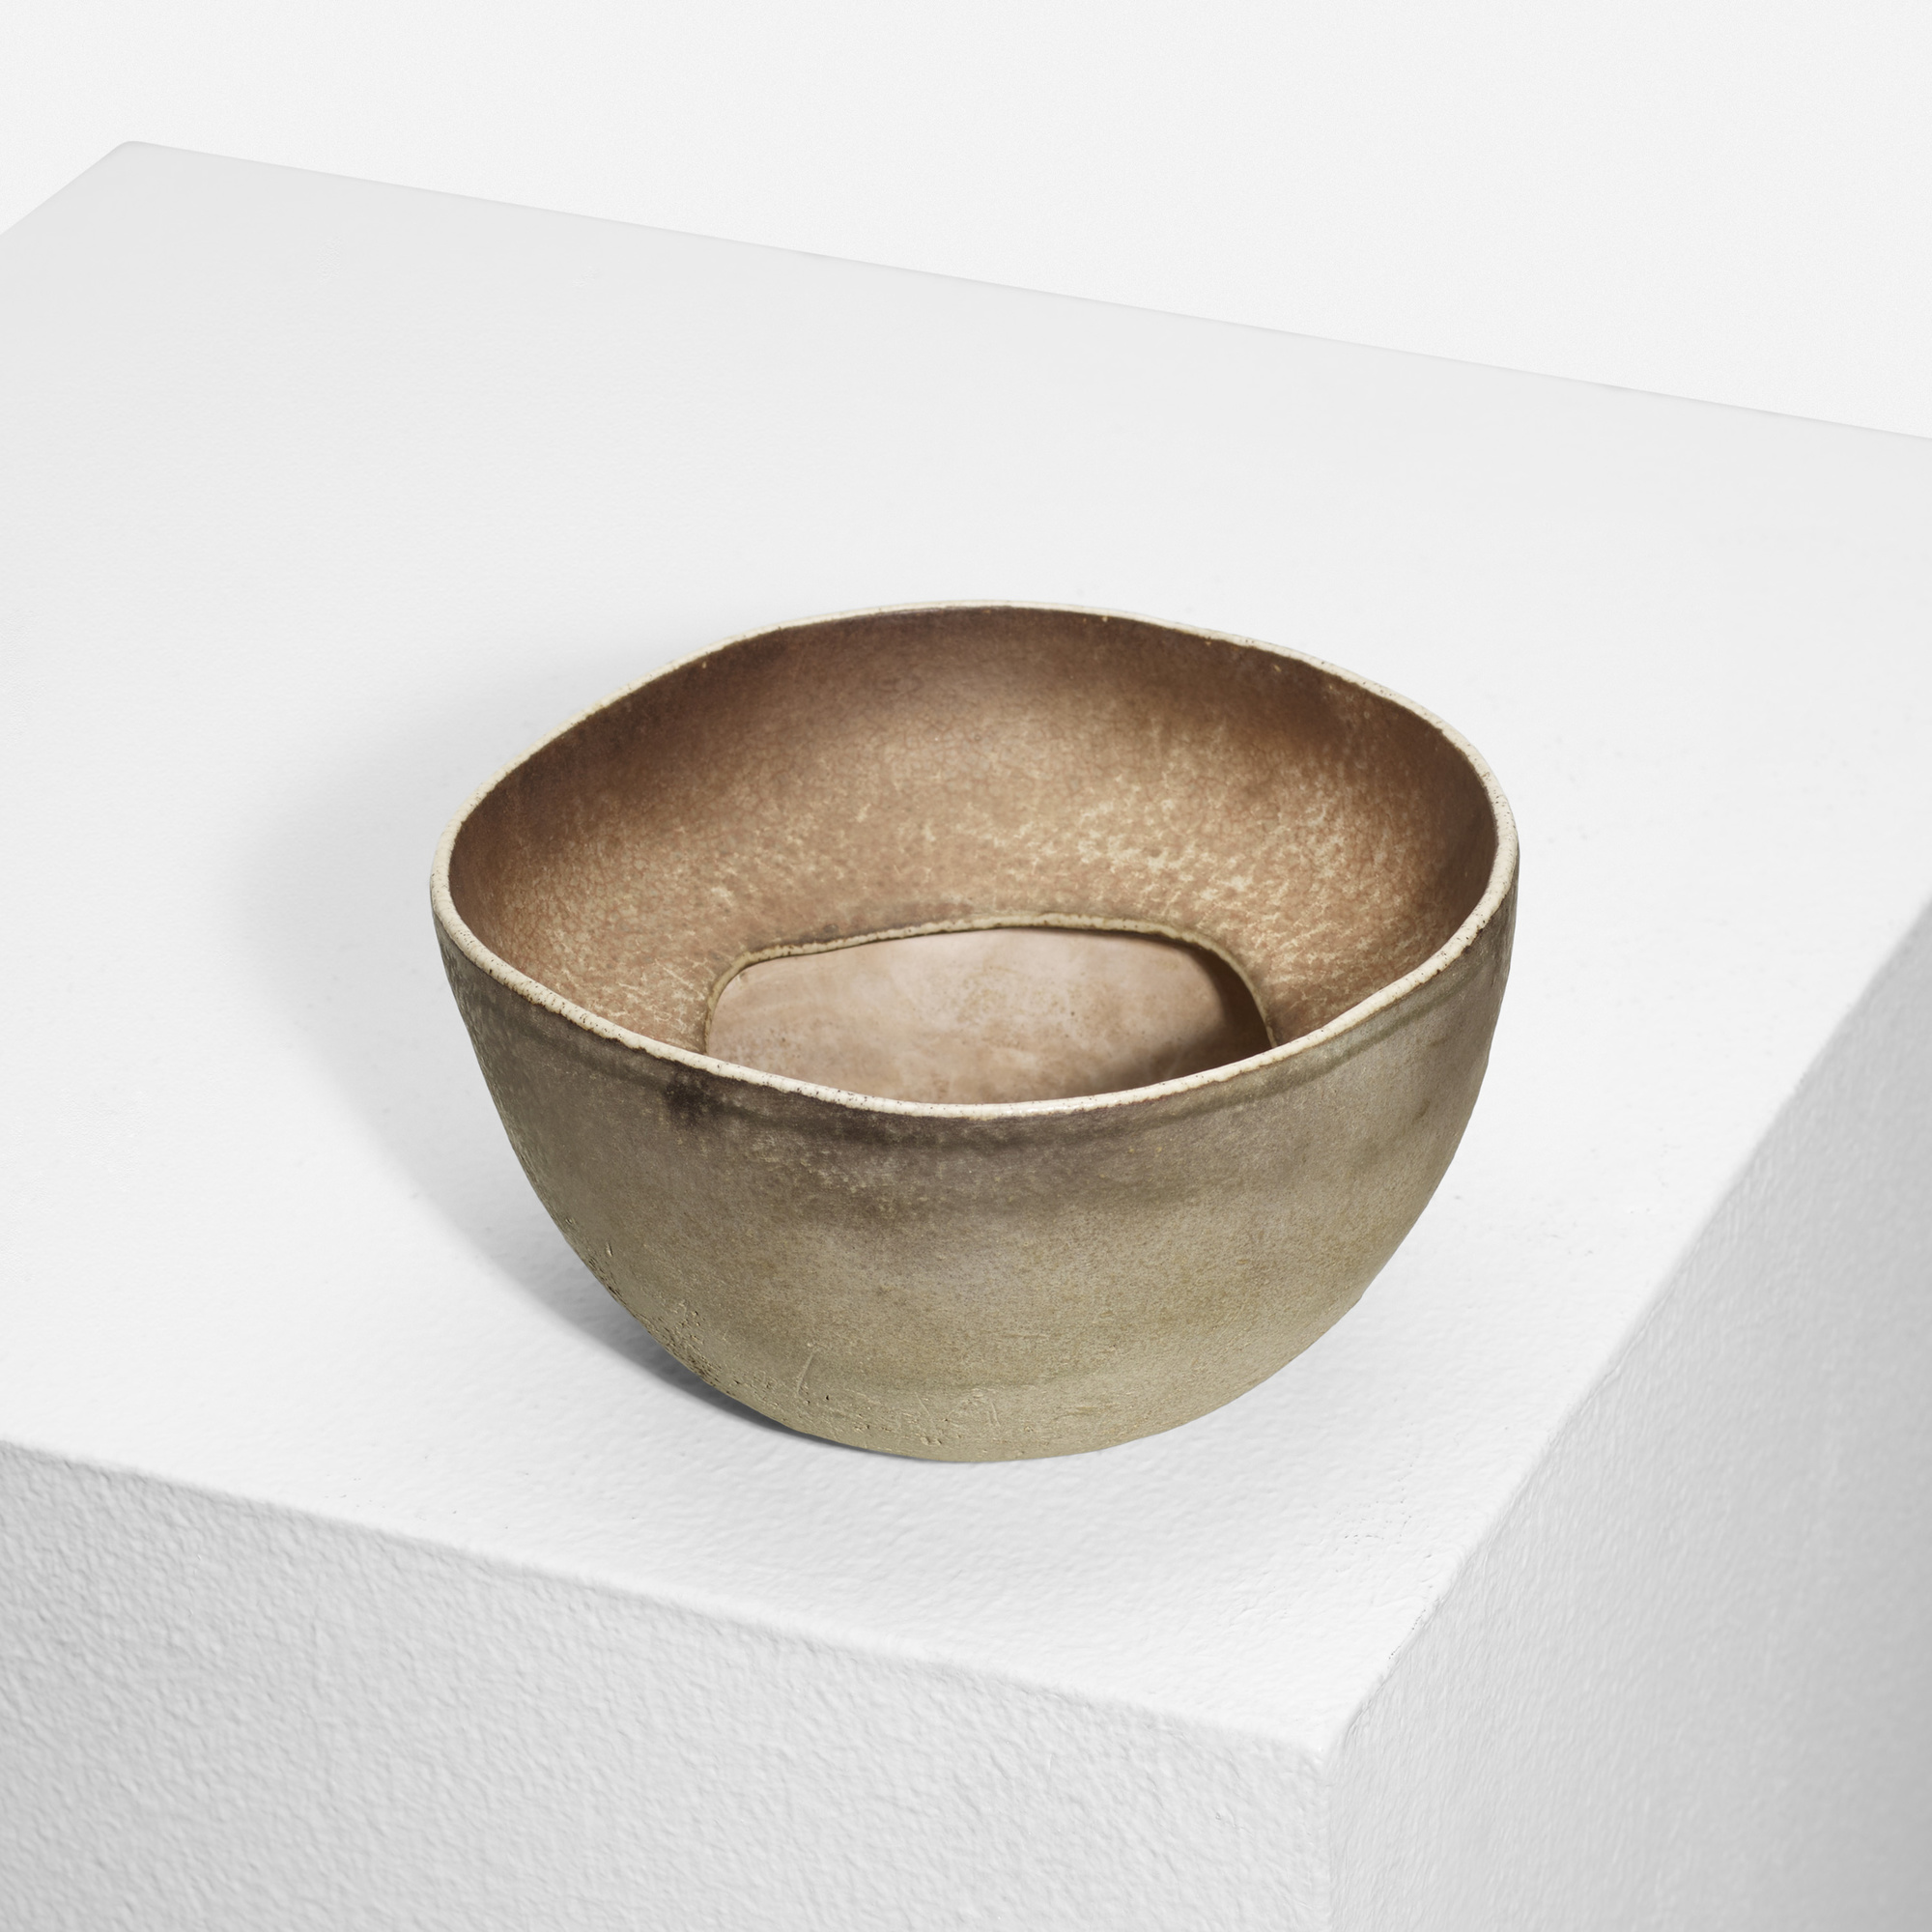 242: Richard DeVore / bowl (1 of 2)